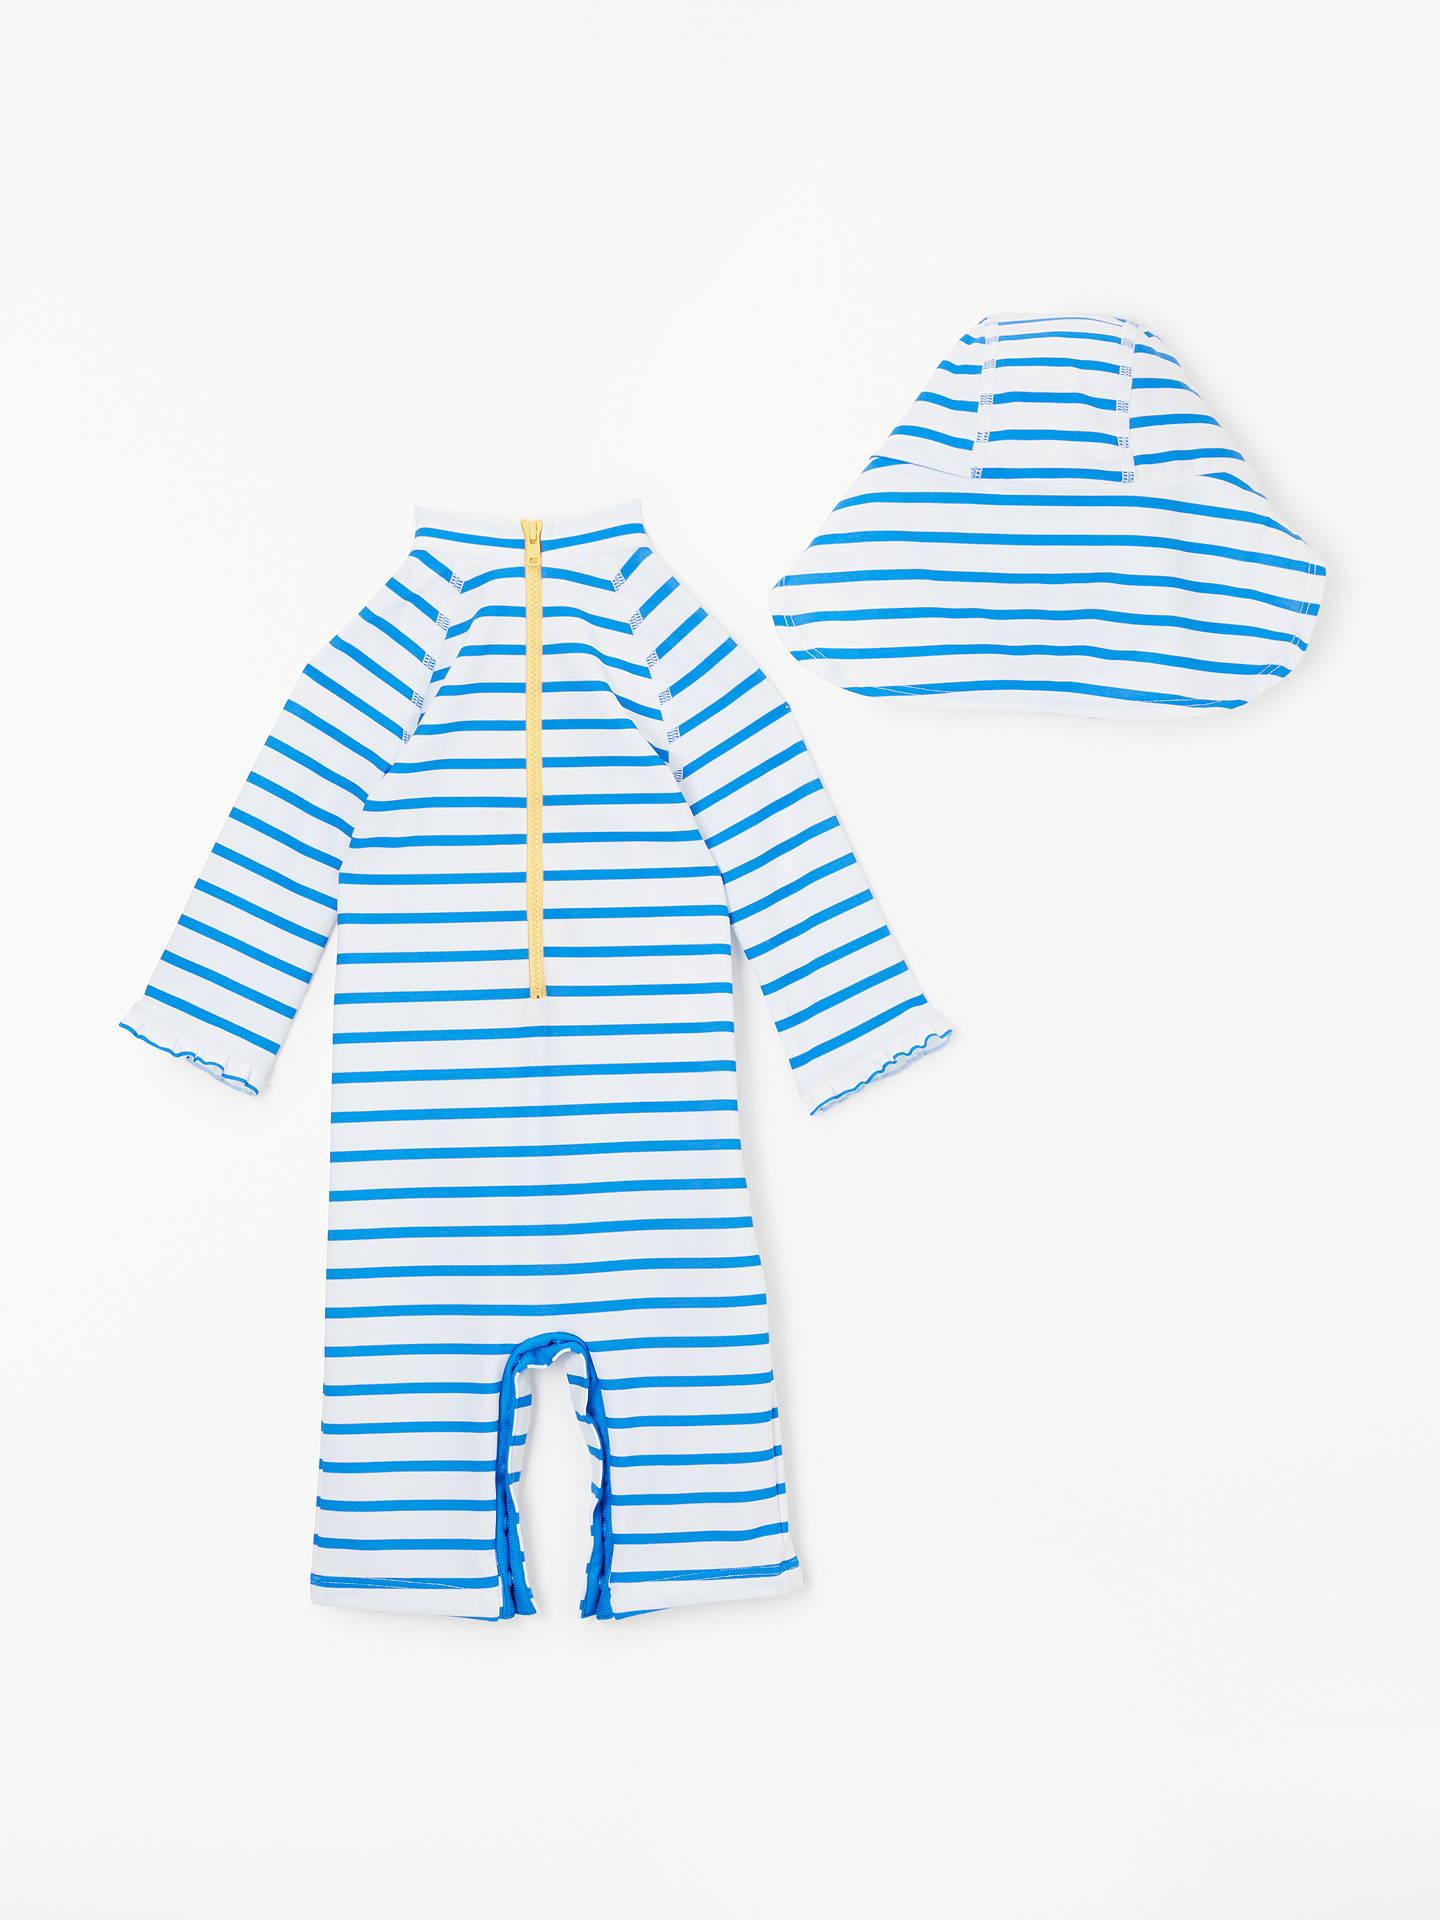 ... BuyJohn Lewis   Partners Baby Mermaid UV SunPro Swimsuit and Hat cb9fb920597f